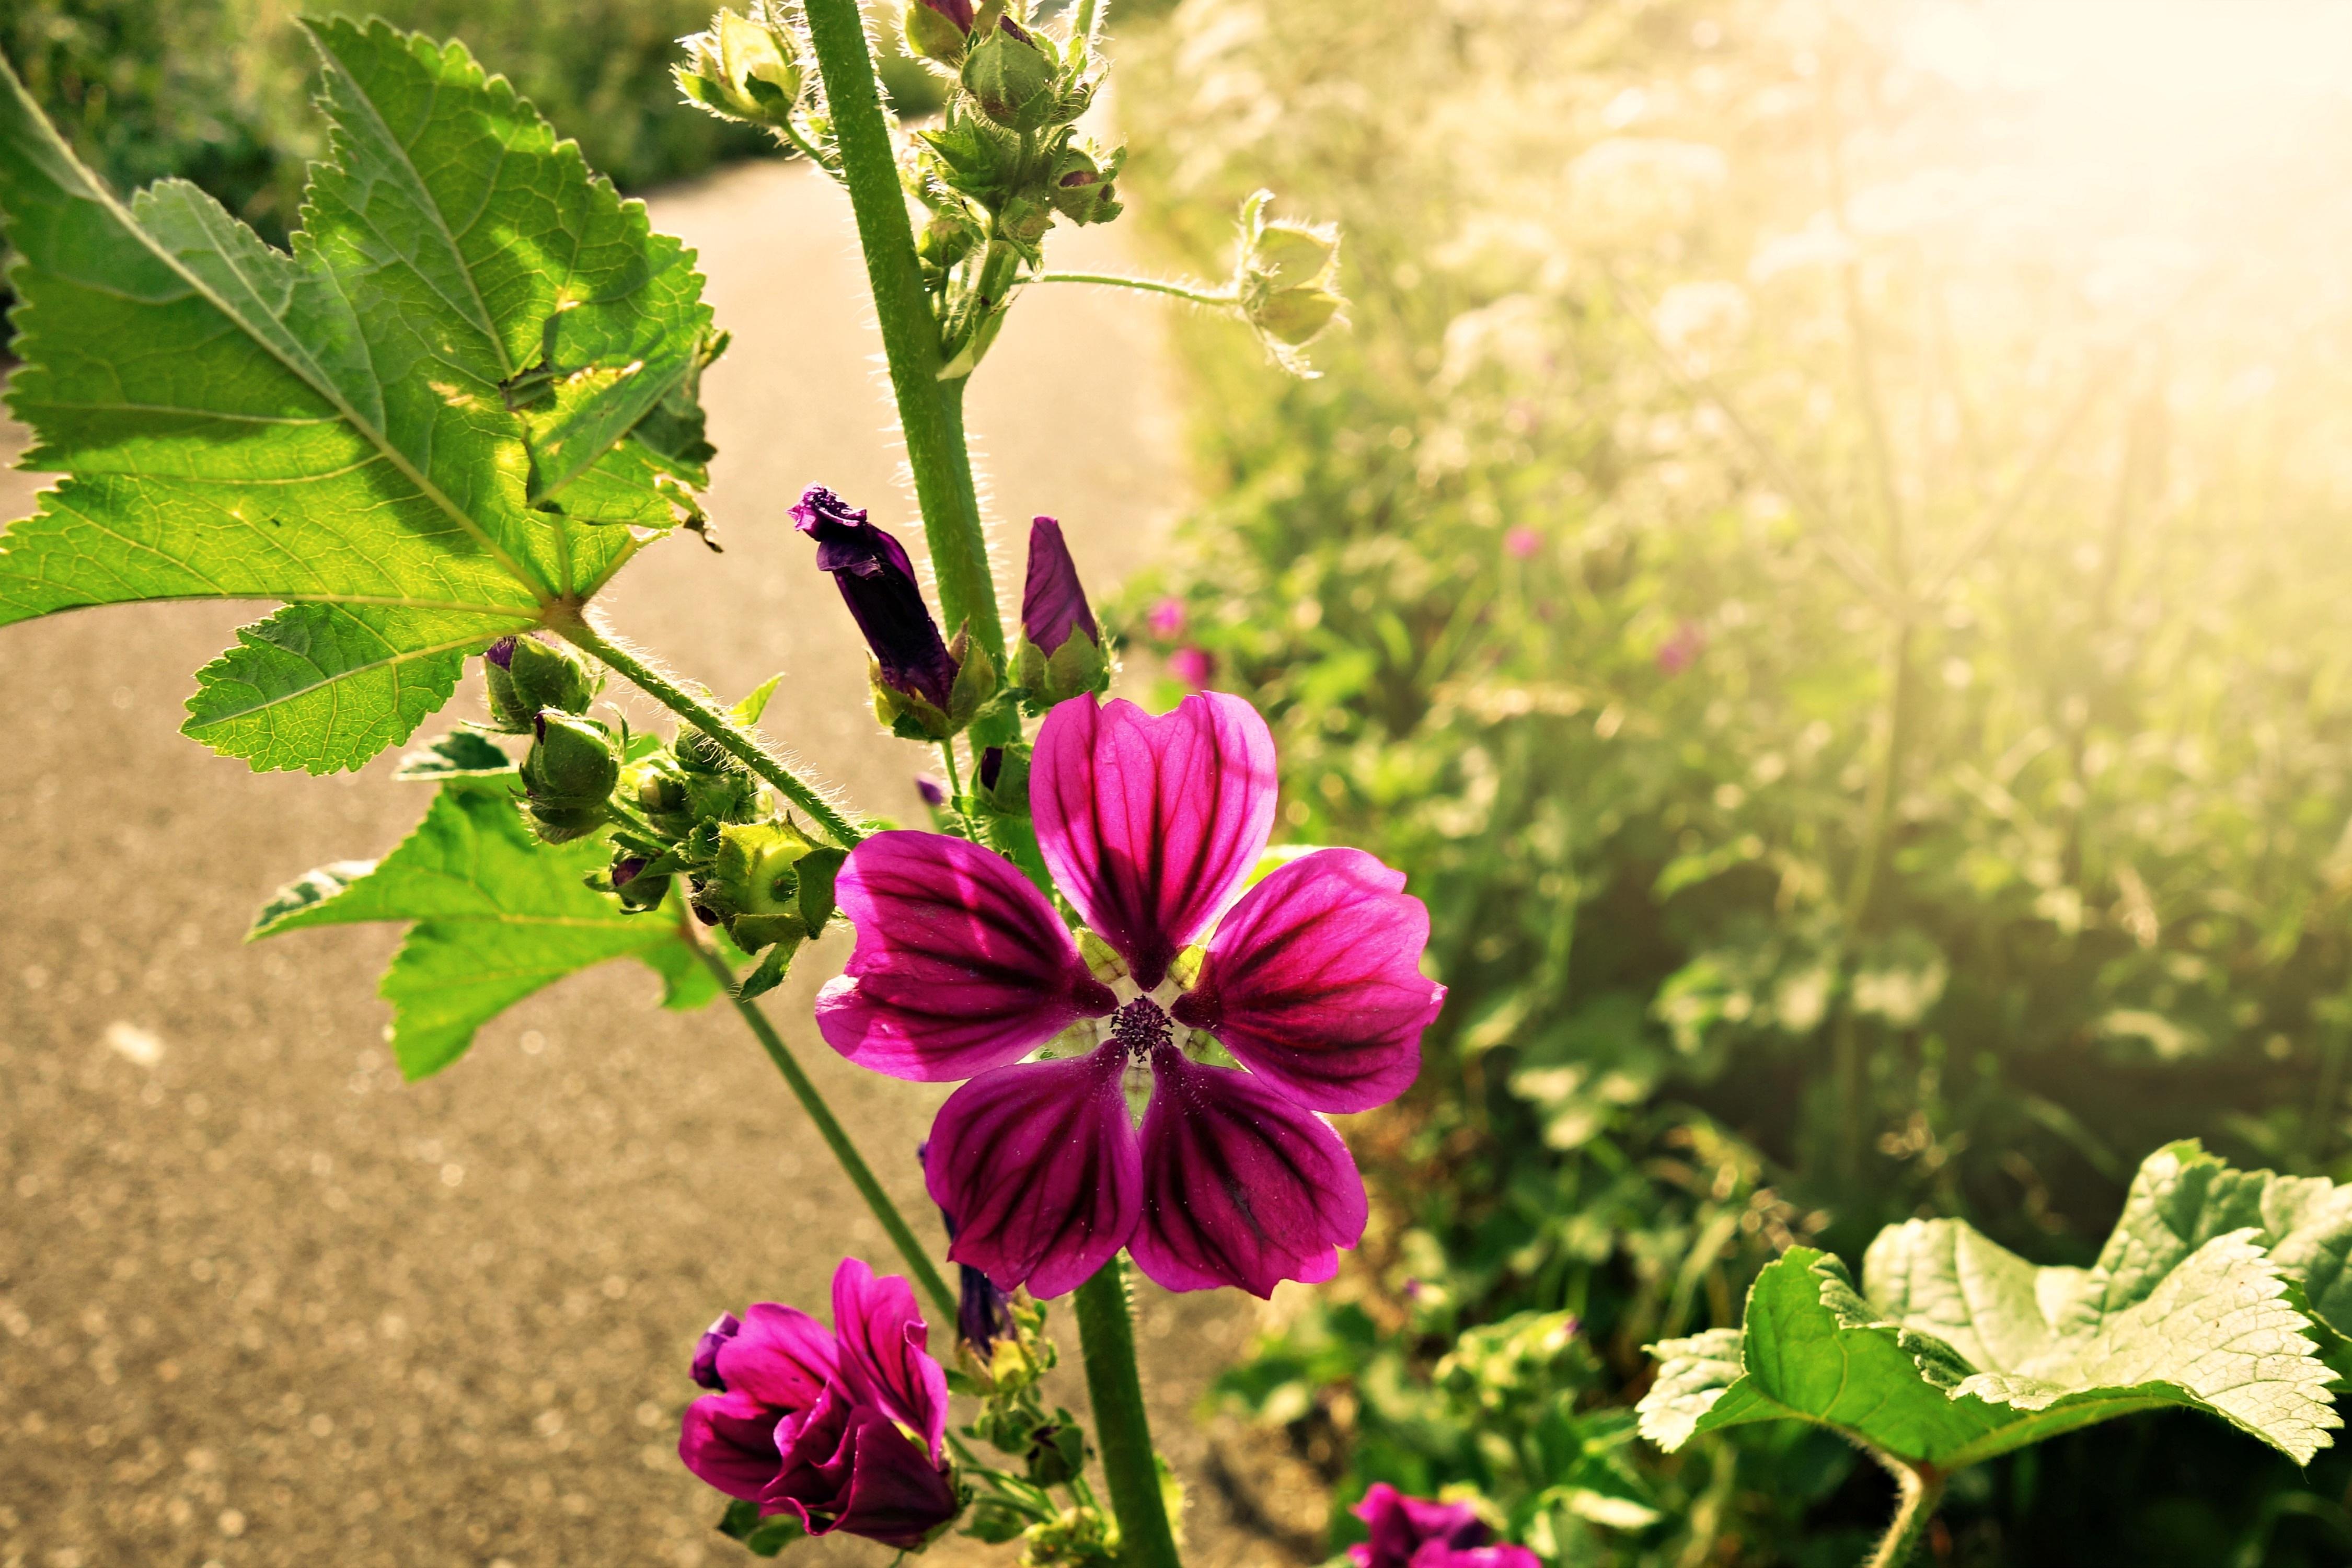 kostenlose foto natur bl hen feld fotografie lila sommer nat rlich botanik garten. Black Bedroom Furniture Sets. Home Design Ideas